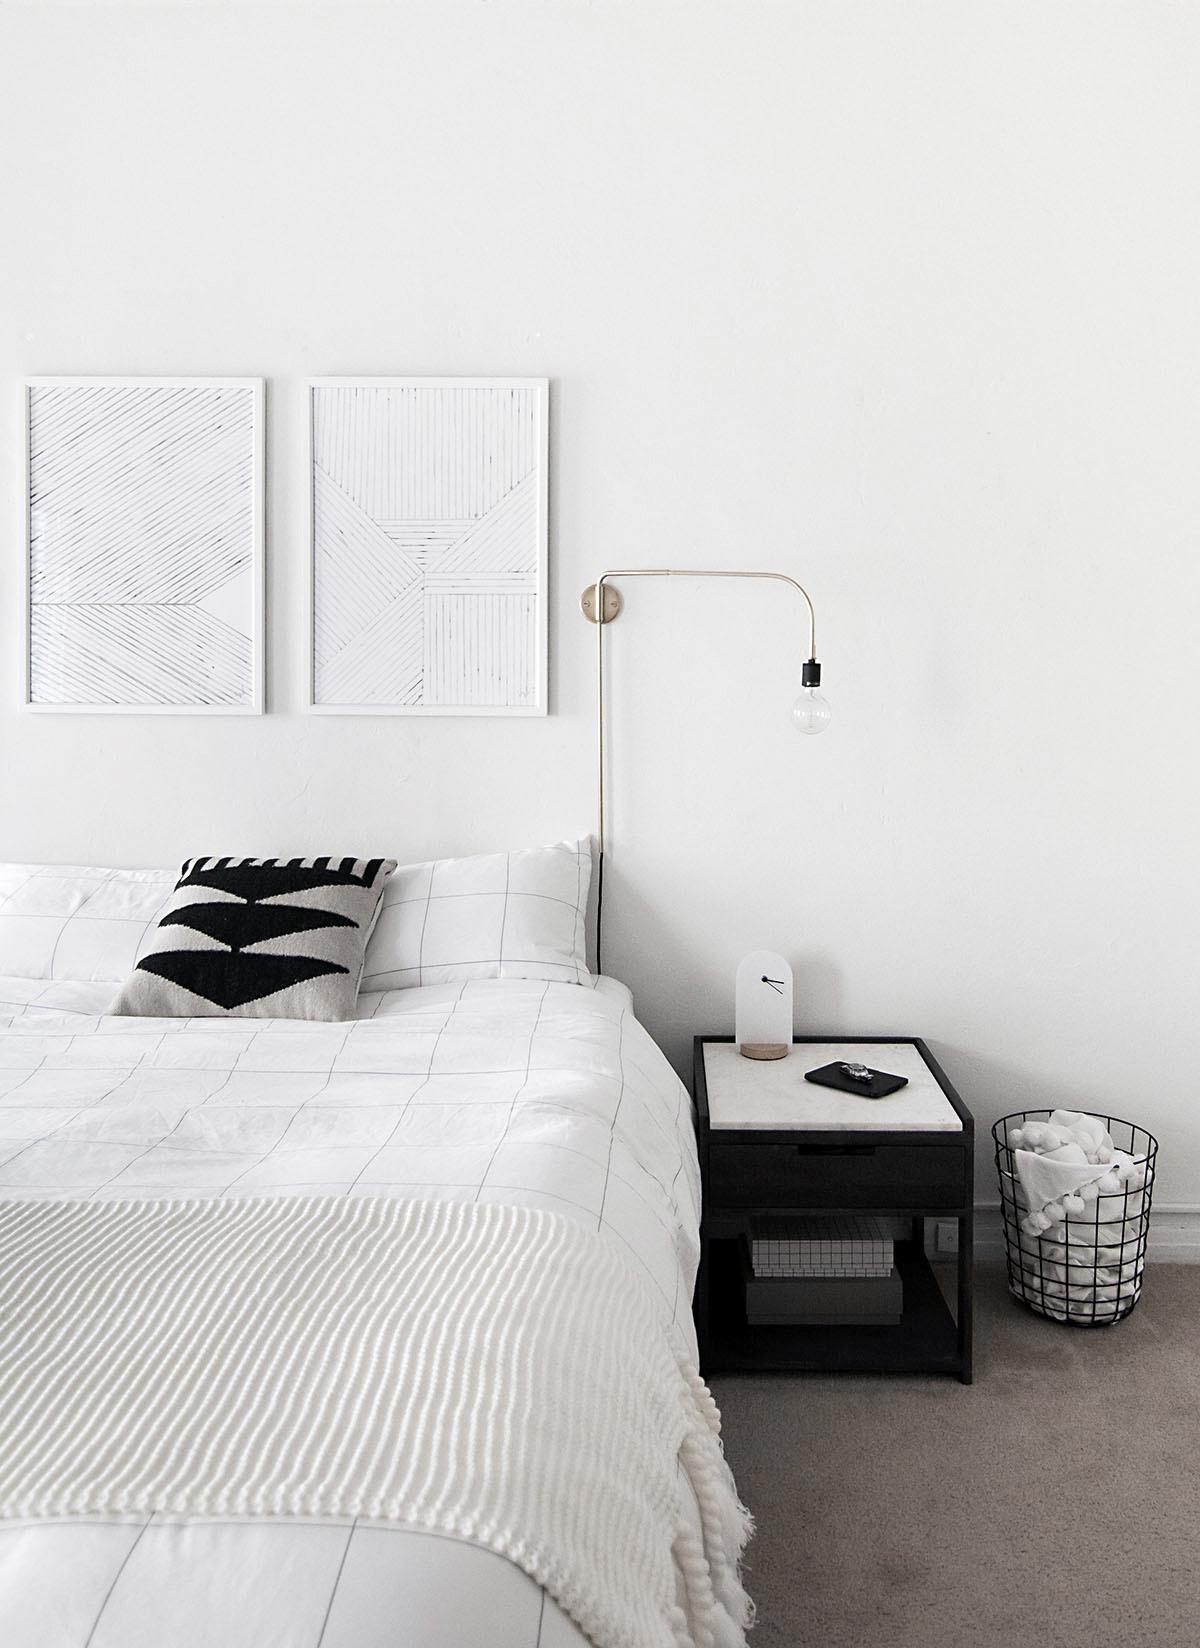 How to Achieve a Minimal Scandinavian Bedroom - Homey Oh My on Minimalist Bedroom  id=46847